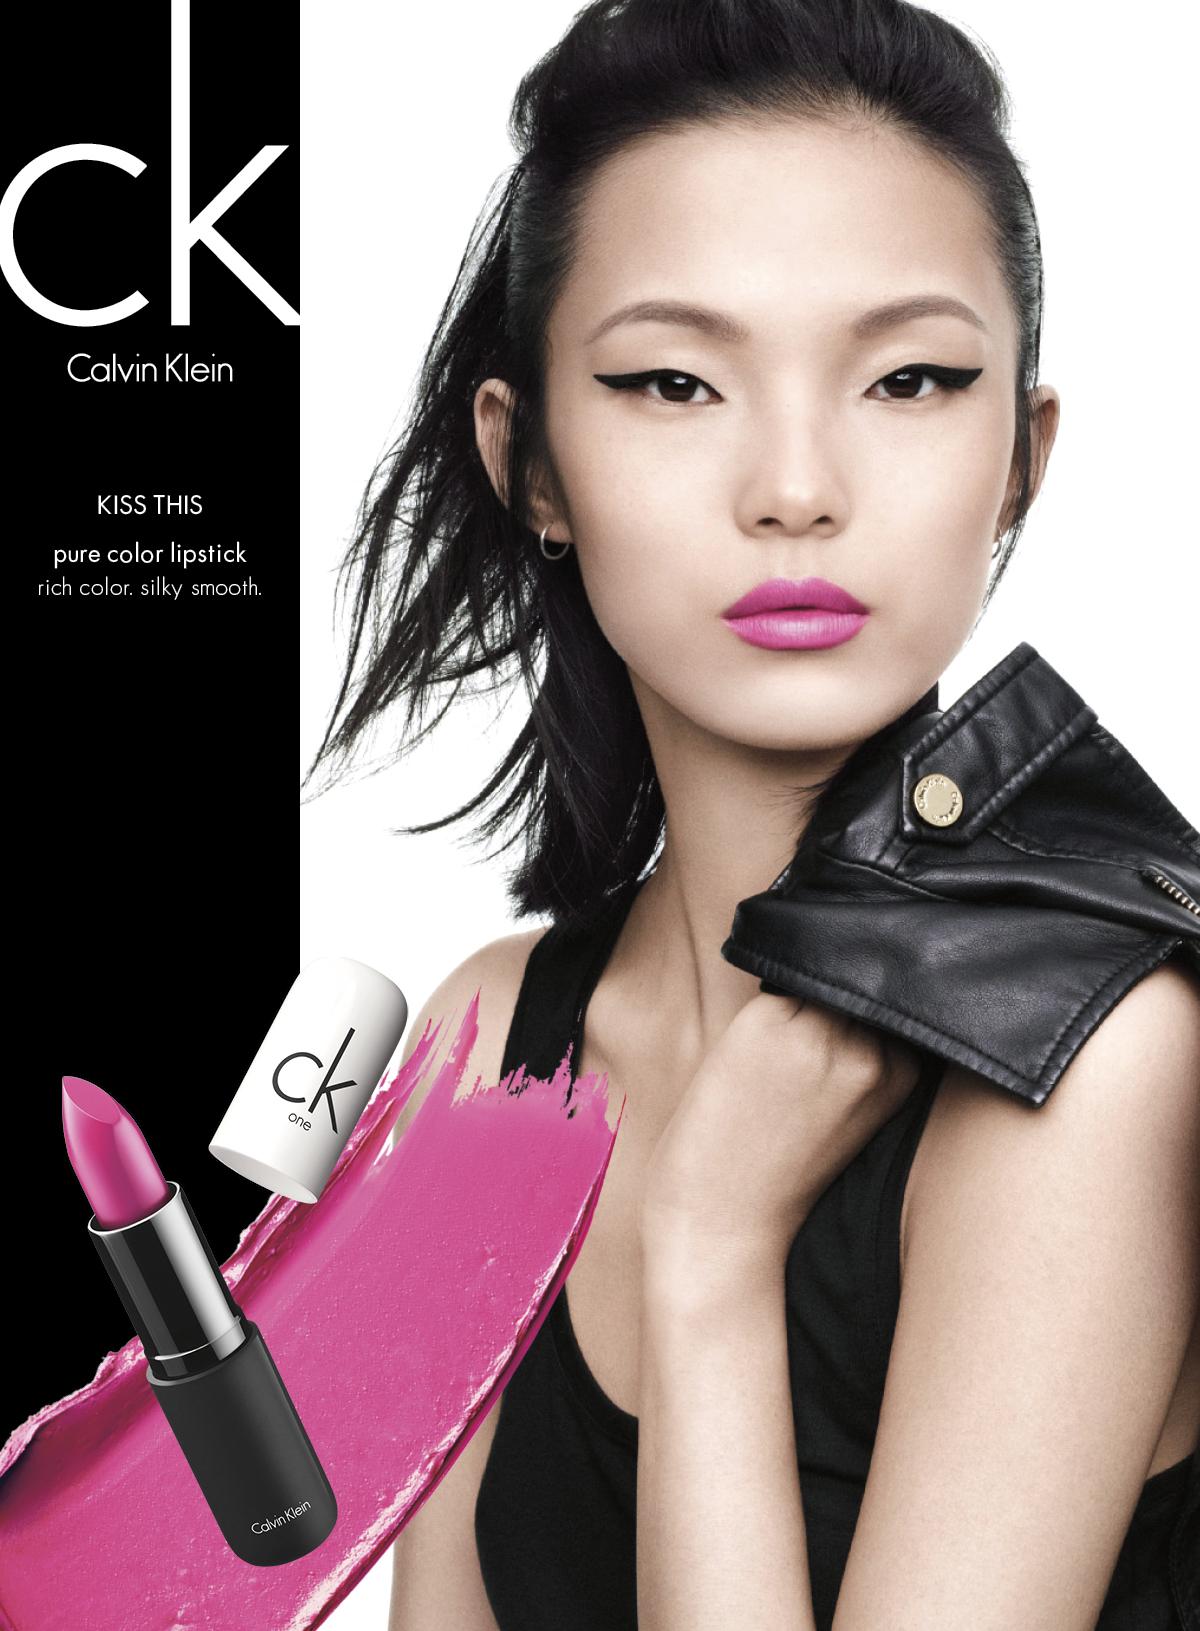 CK COLOR SINGLE PAGE 8%22X10.875%22_CHINA PURE COLOR LIPSTICK.jpg